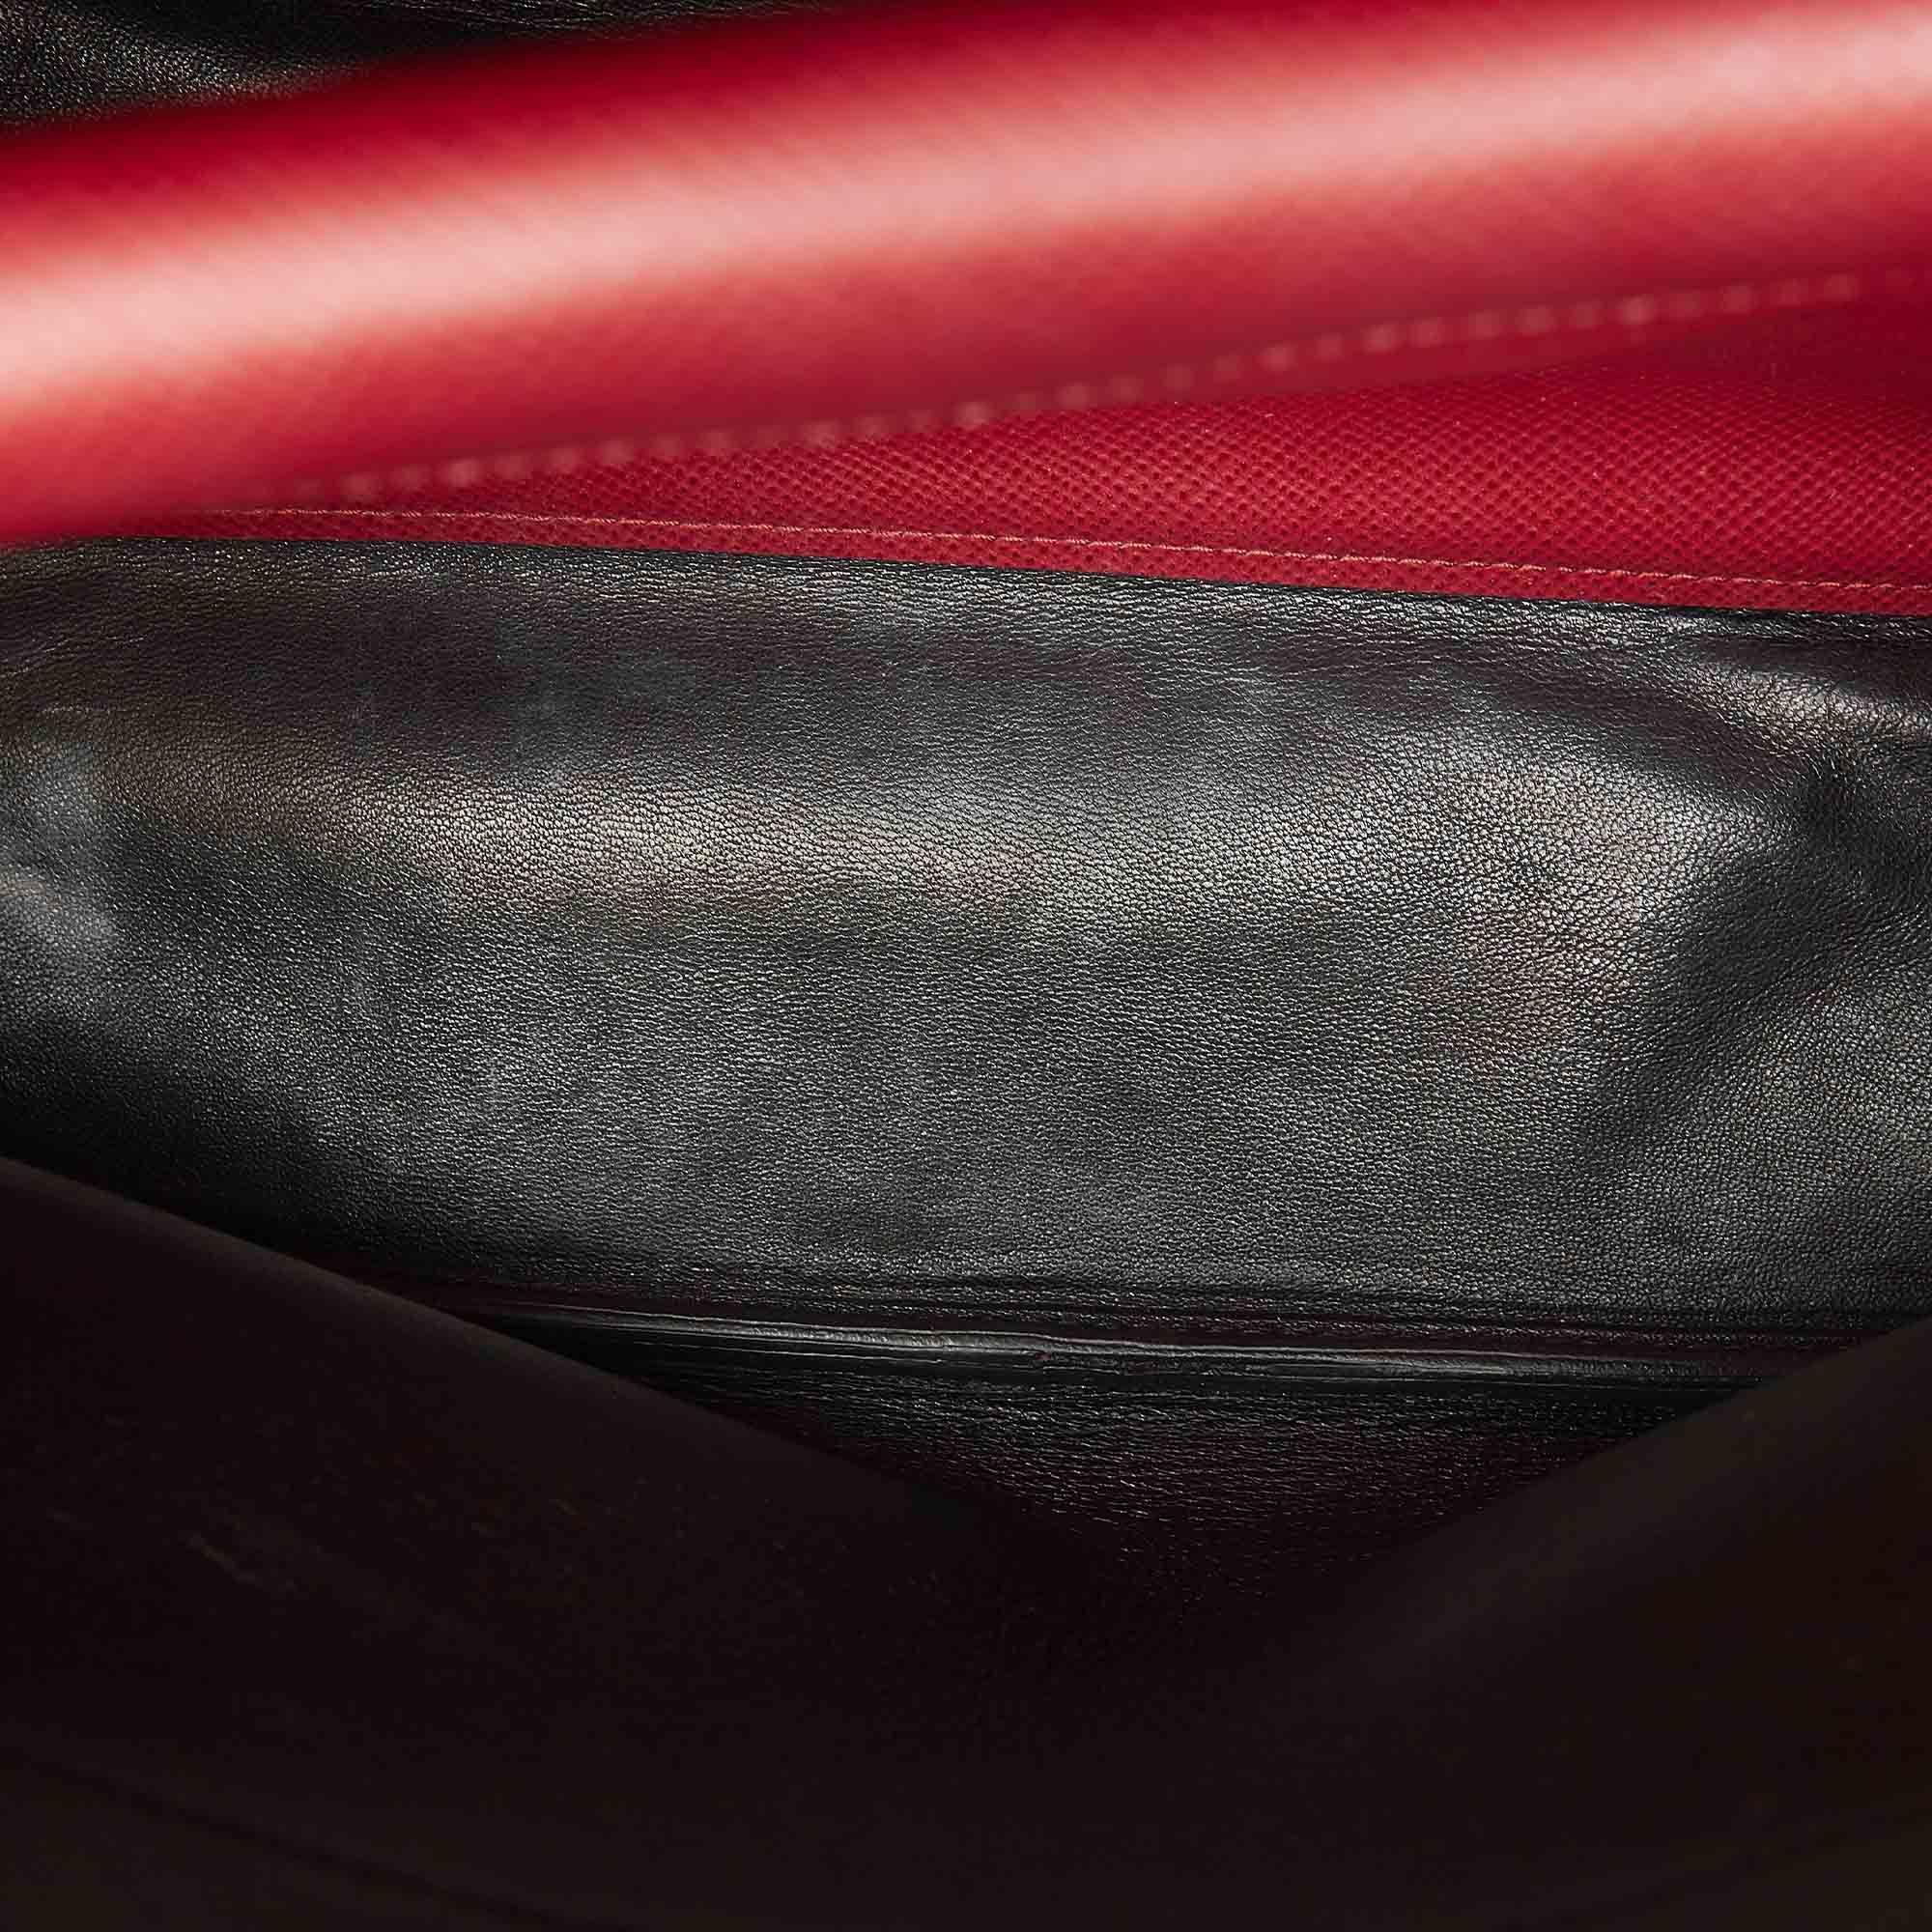 Vintage Prada Saffiano Handbag Red